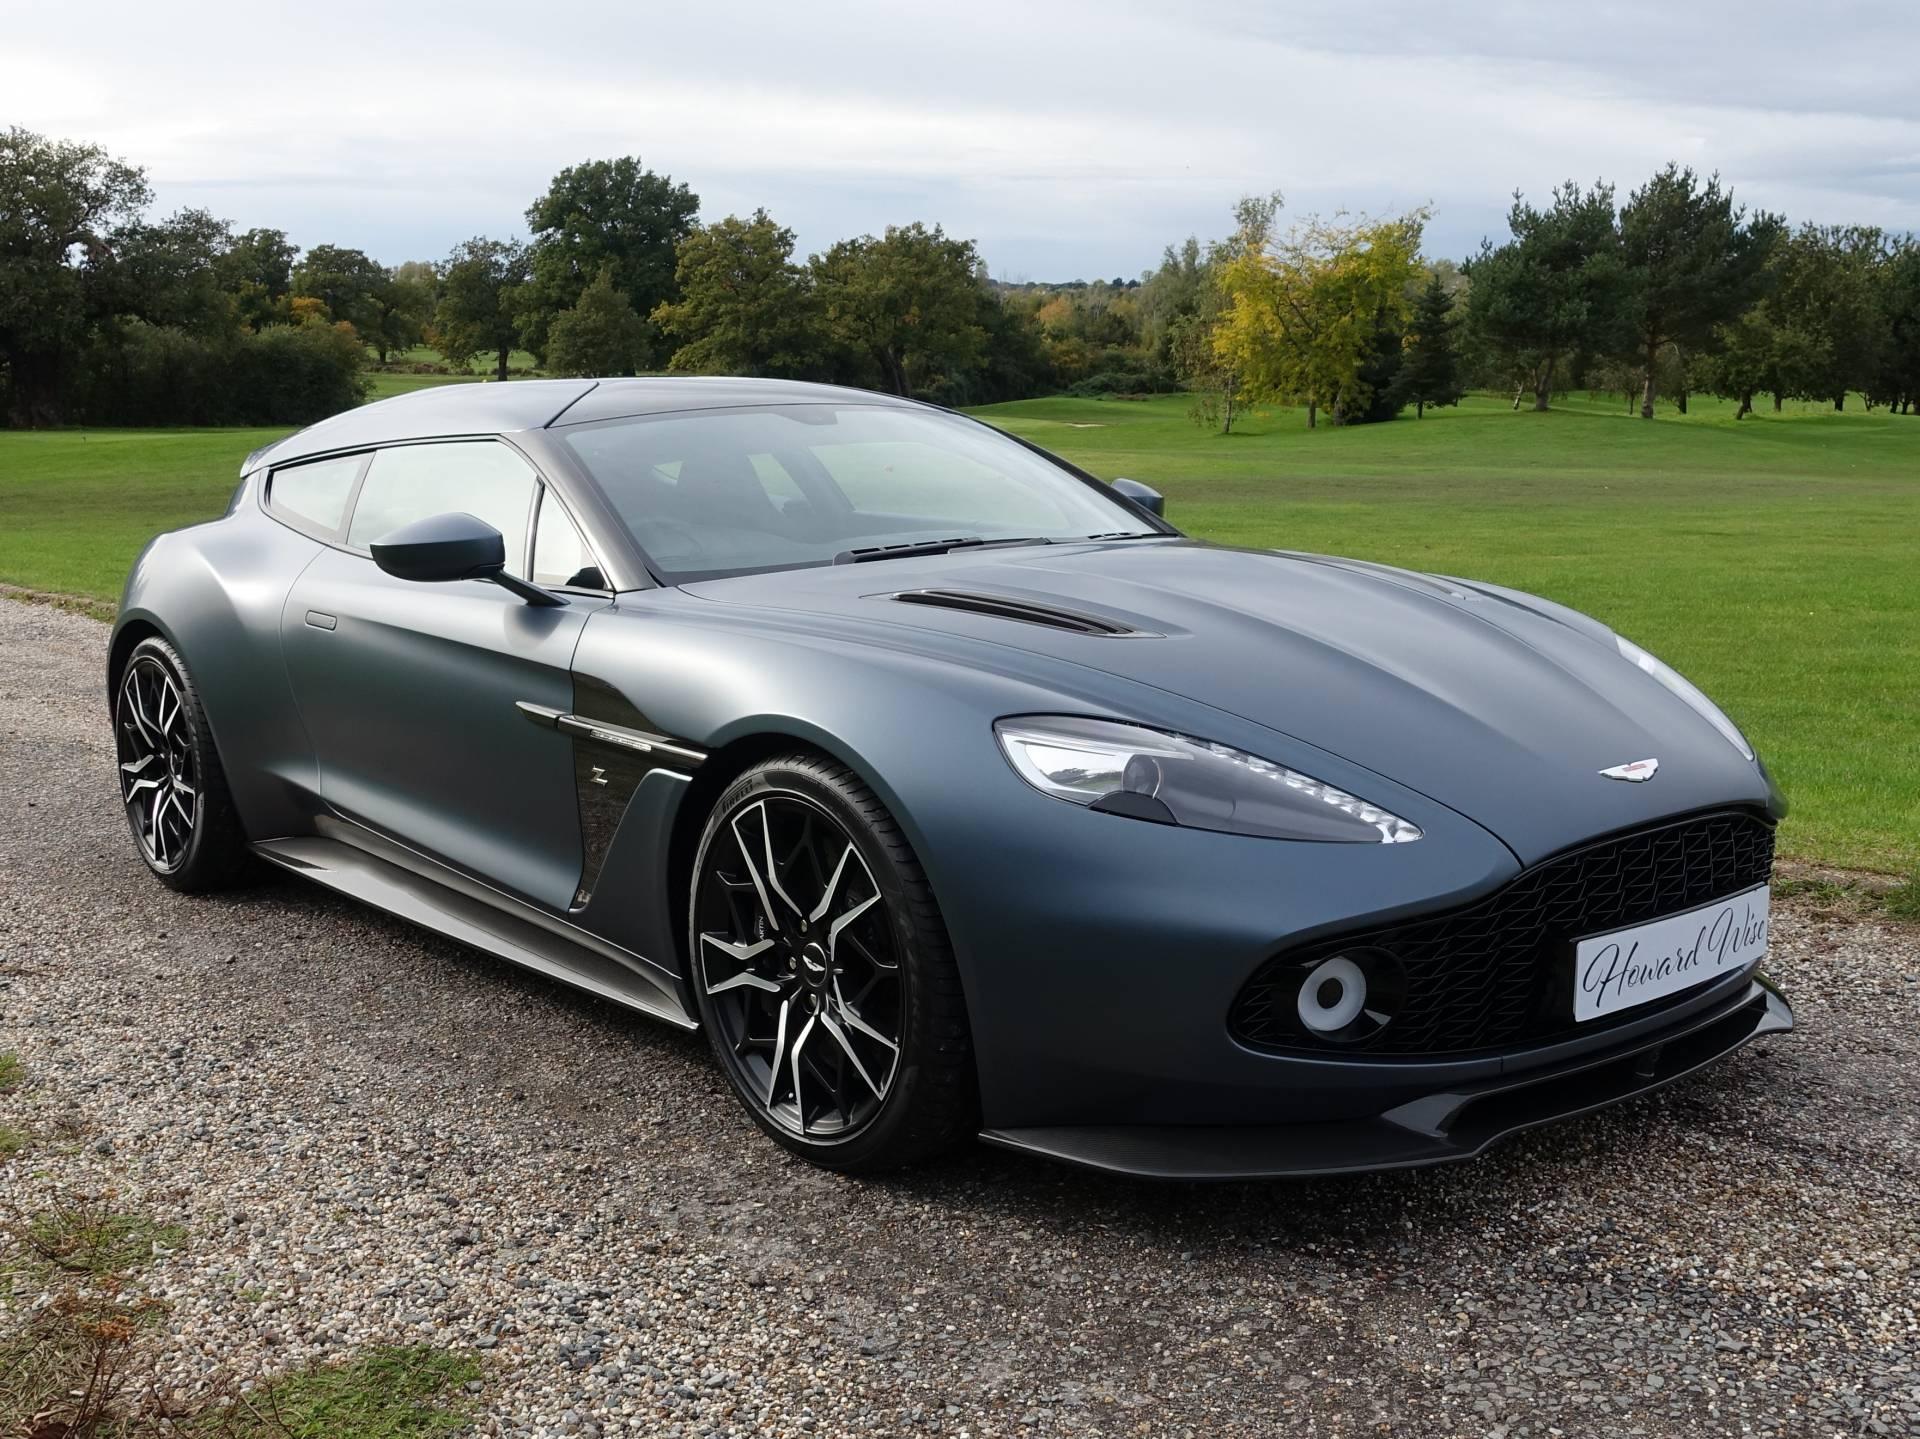 For Sale Aston Martin Vanquish Zagato Shooting Brake 2019 Offered For Gbp 699 995